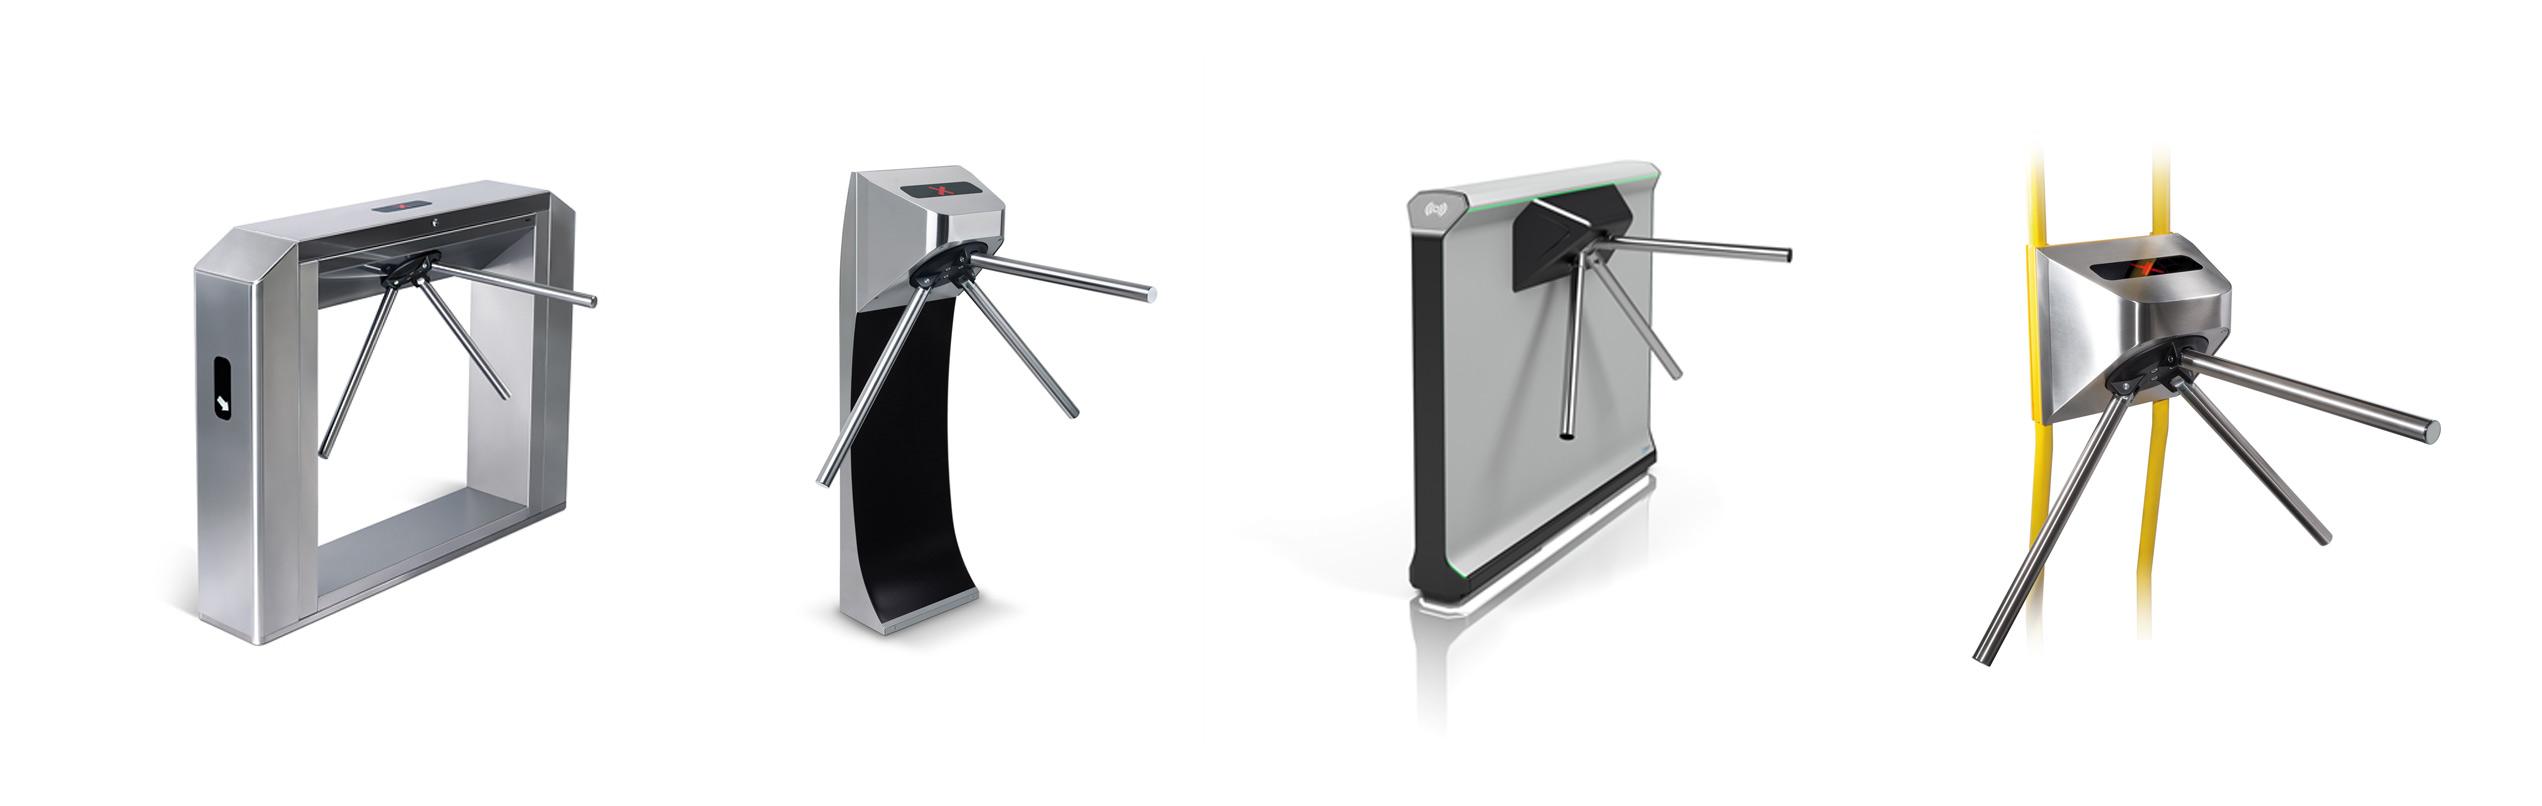 tripod-turnstile